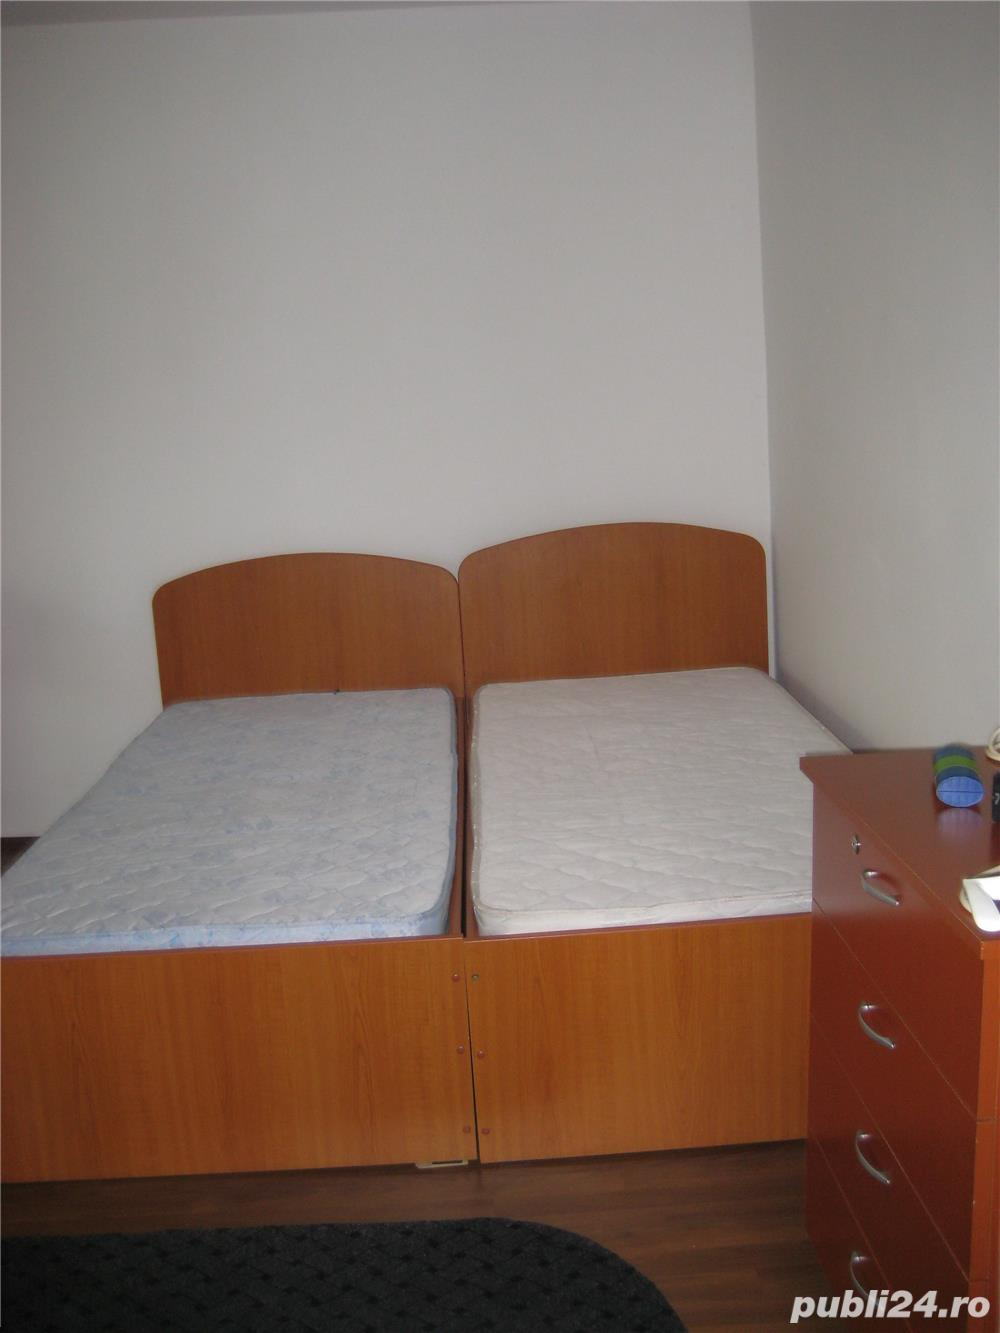 P.F. Inchiriez  Apartament 1 cam. 43mp Cluj-Napoca. Balcon 9 m cu termopan. Finisat. Cu Centrala.